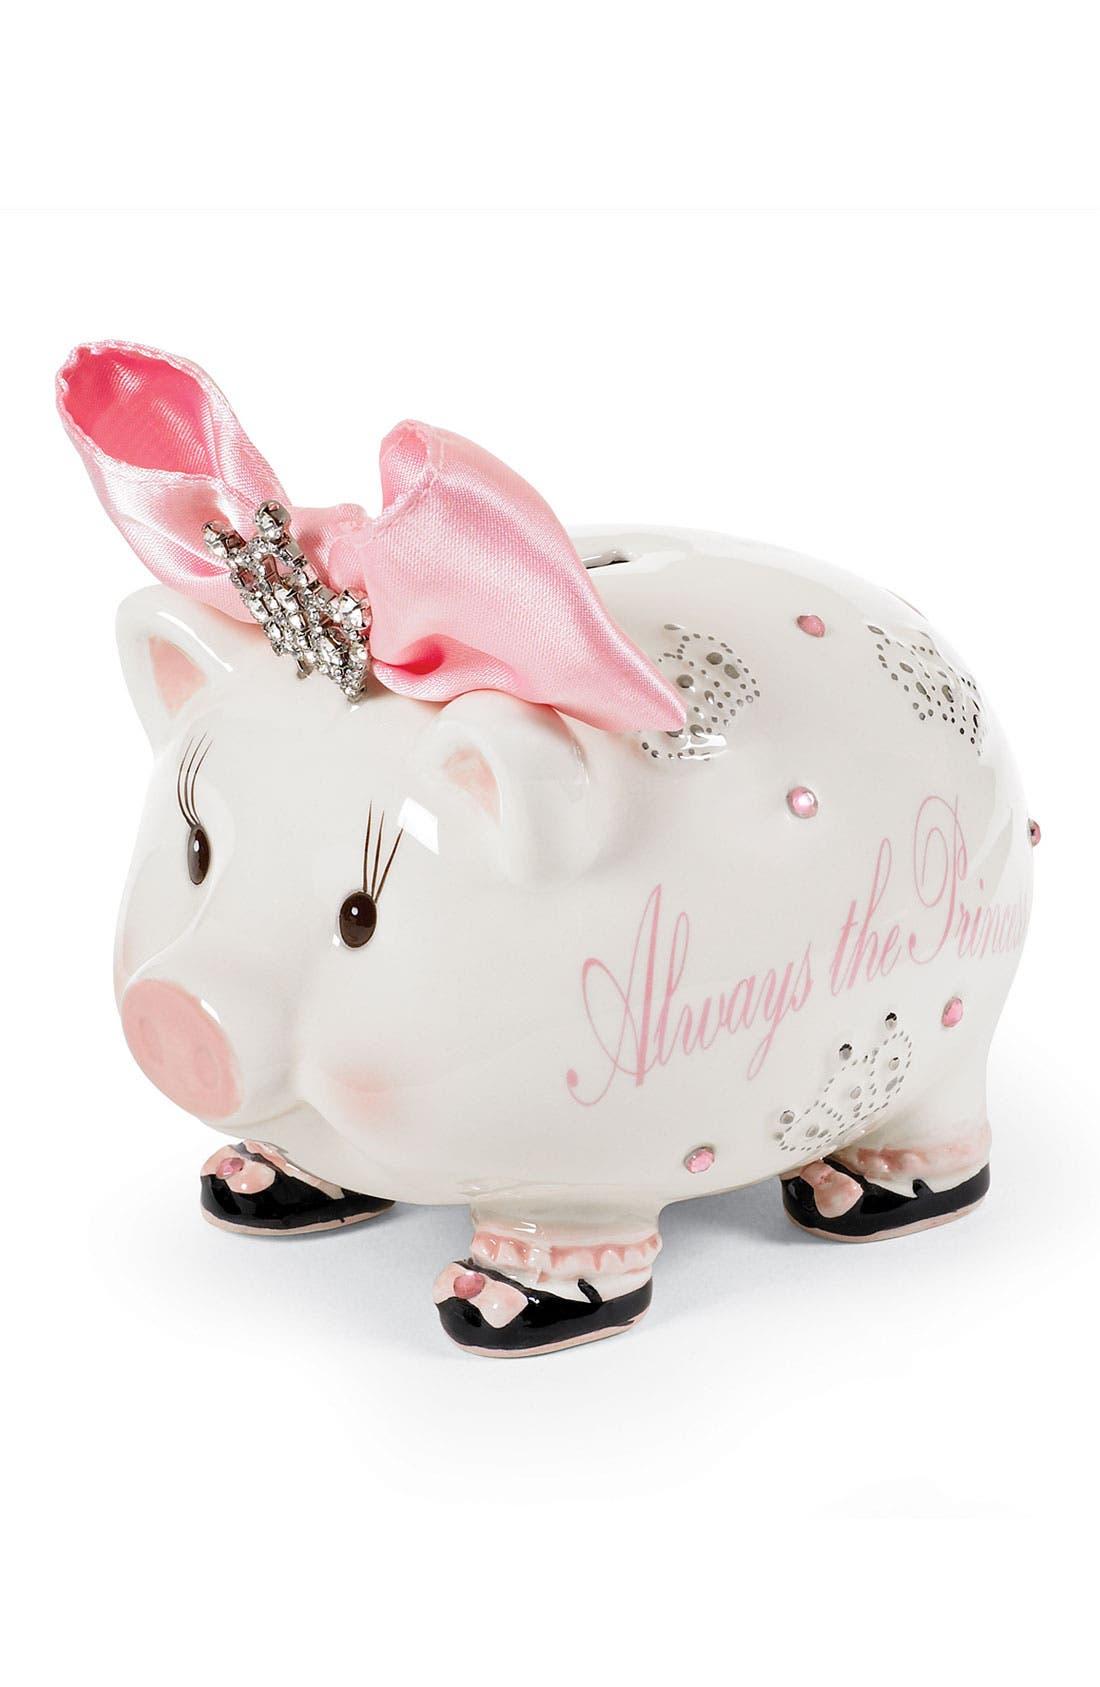 Main Image - Mud Pie 'Always the Princess' Jeweled Piggy Bank